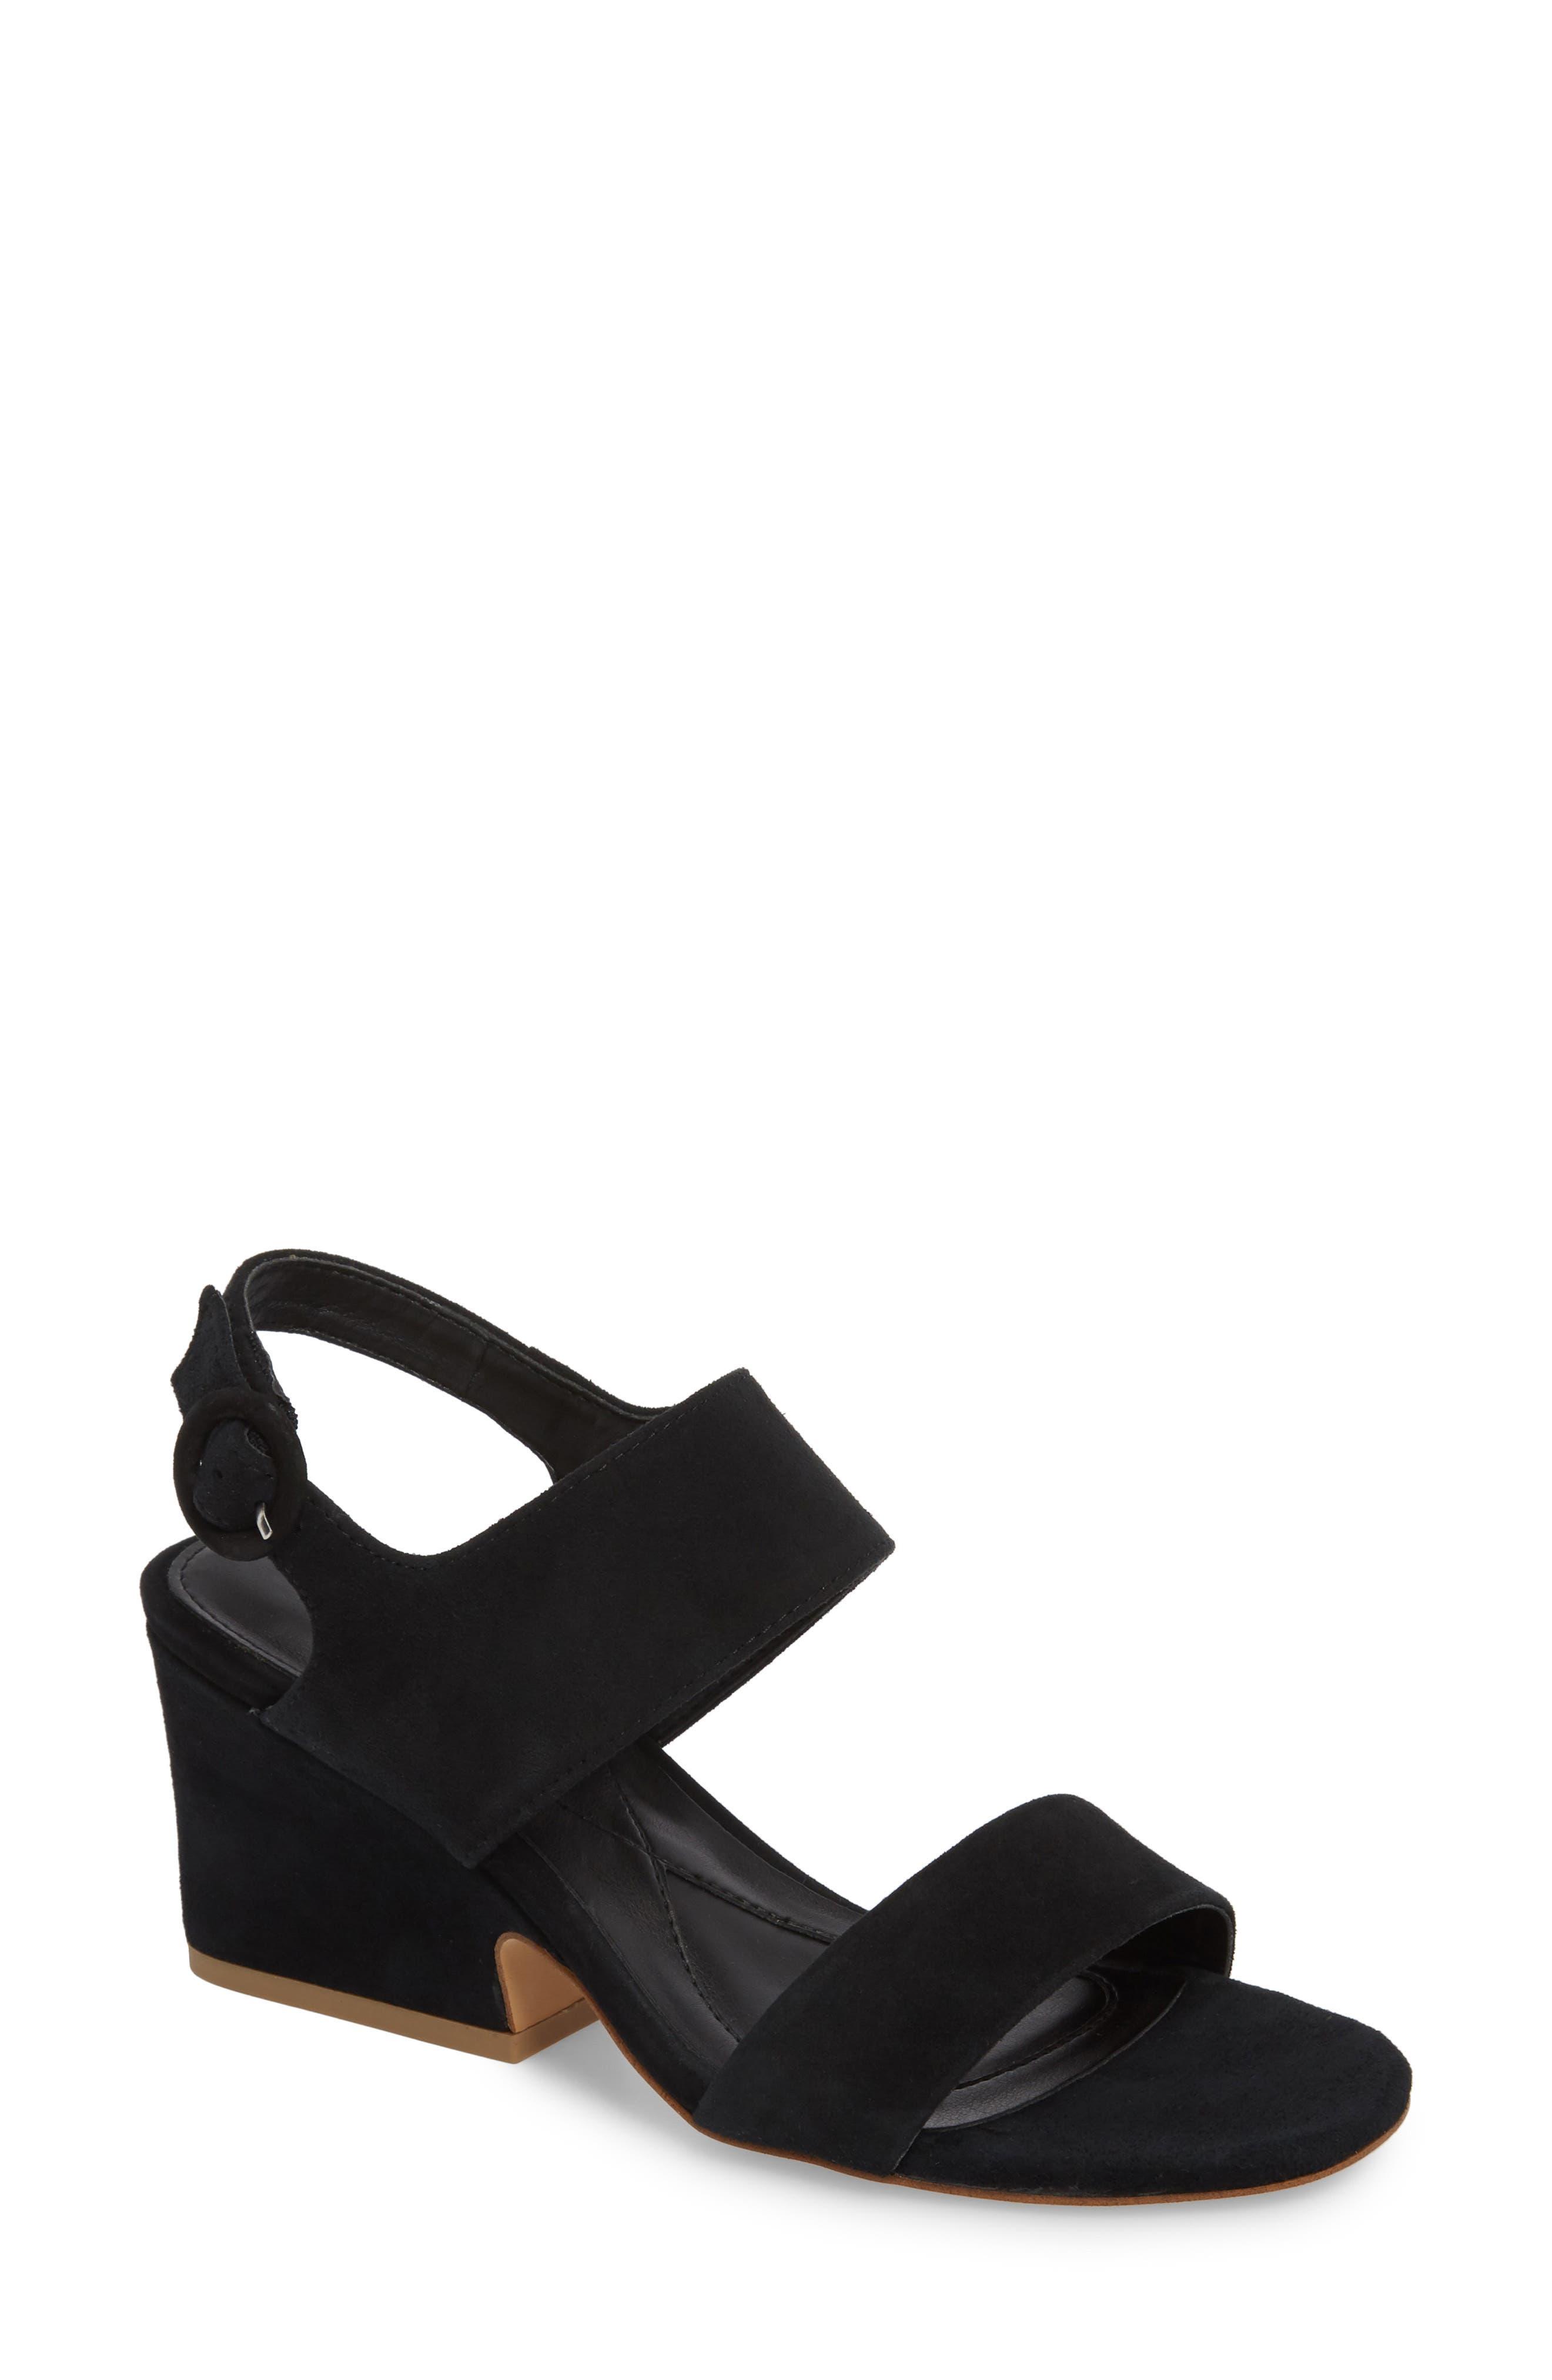 ISOLÁ Isola Landra Block Heel Sandal, Main, color, BLACK SUEDE